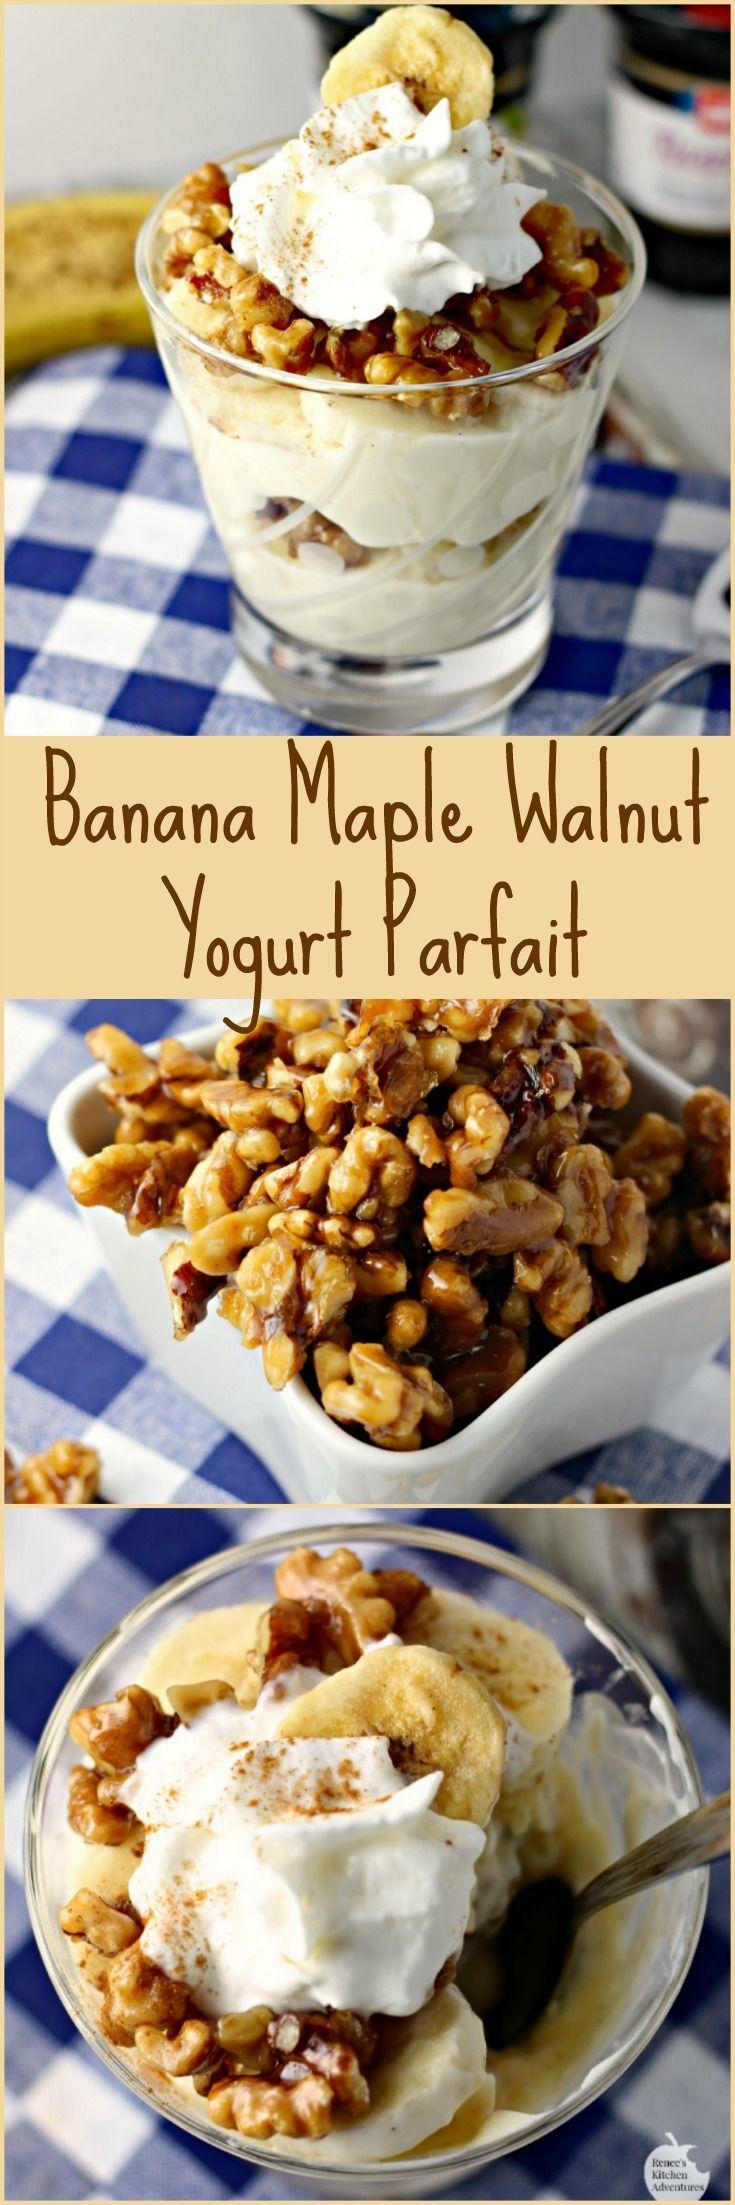 Banana Maple Walnut Yogurt Parfait | Kitchen Adventures:  Wholesome treat full of fresh bananas, vanilla bean yogurt and Maple Walnuts! #MullerMoment #ad